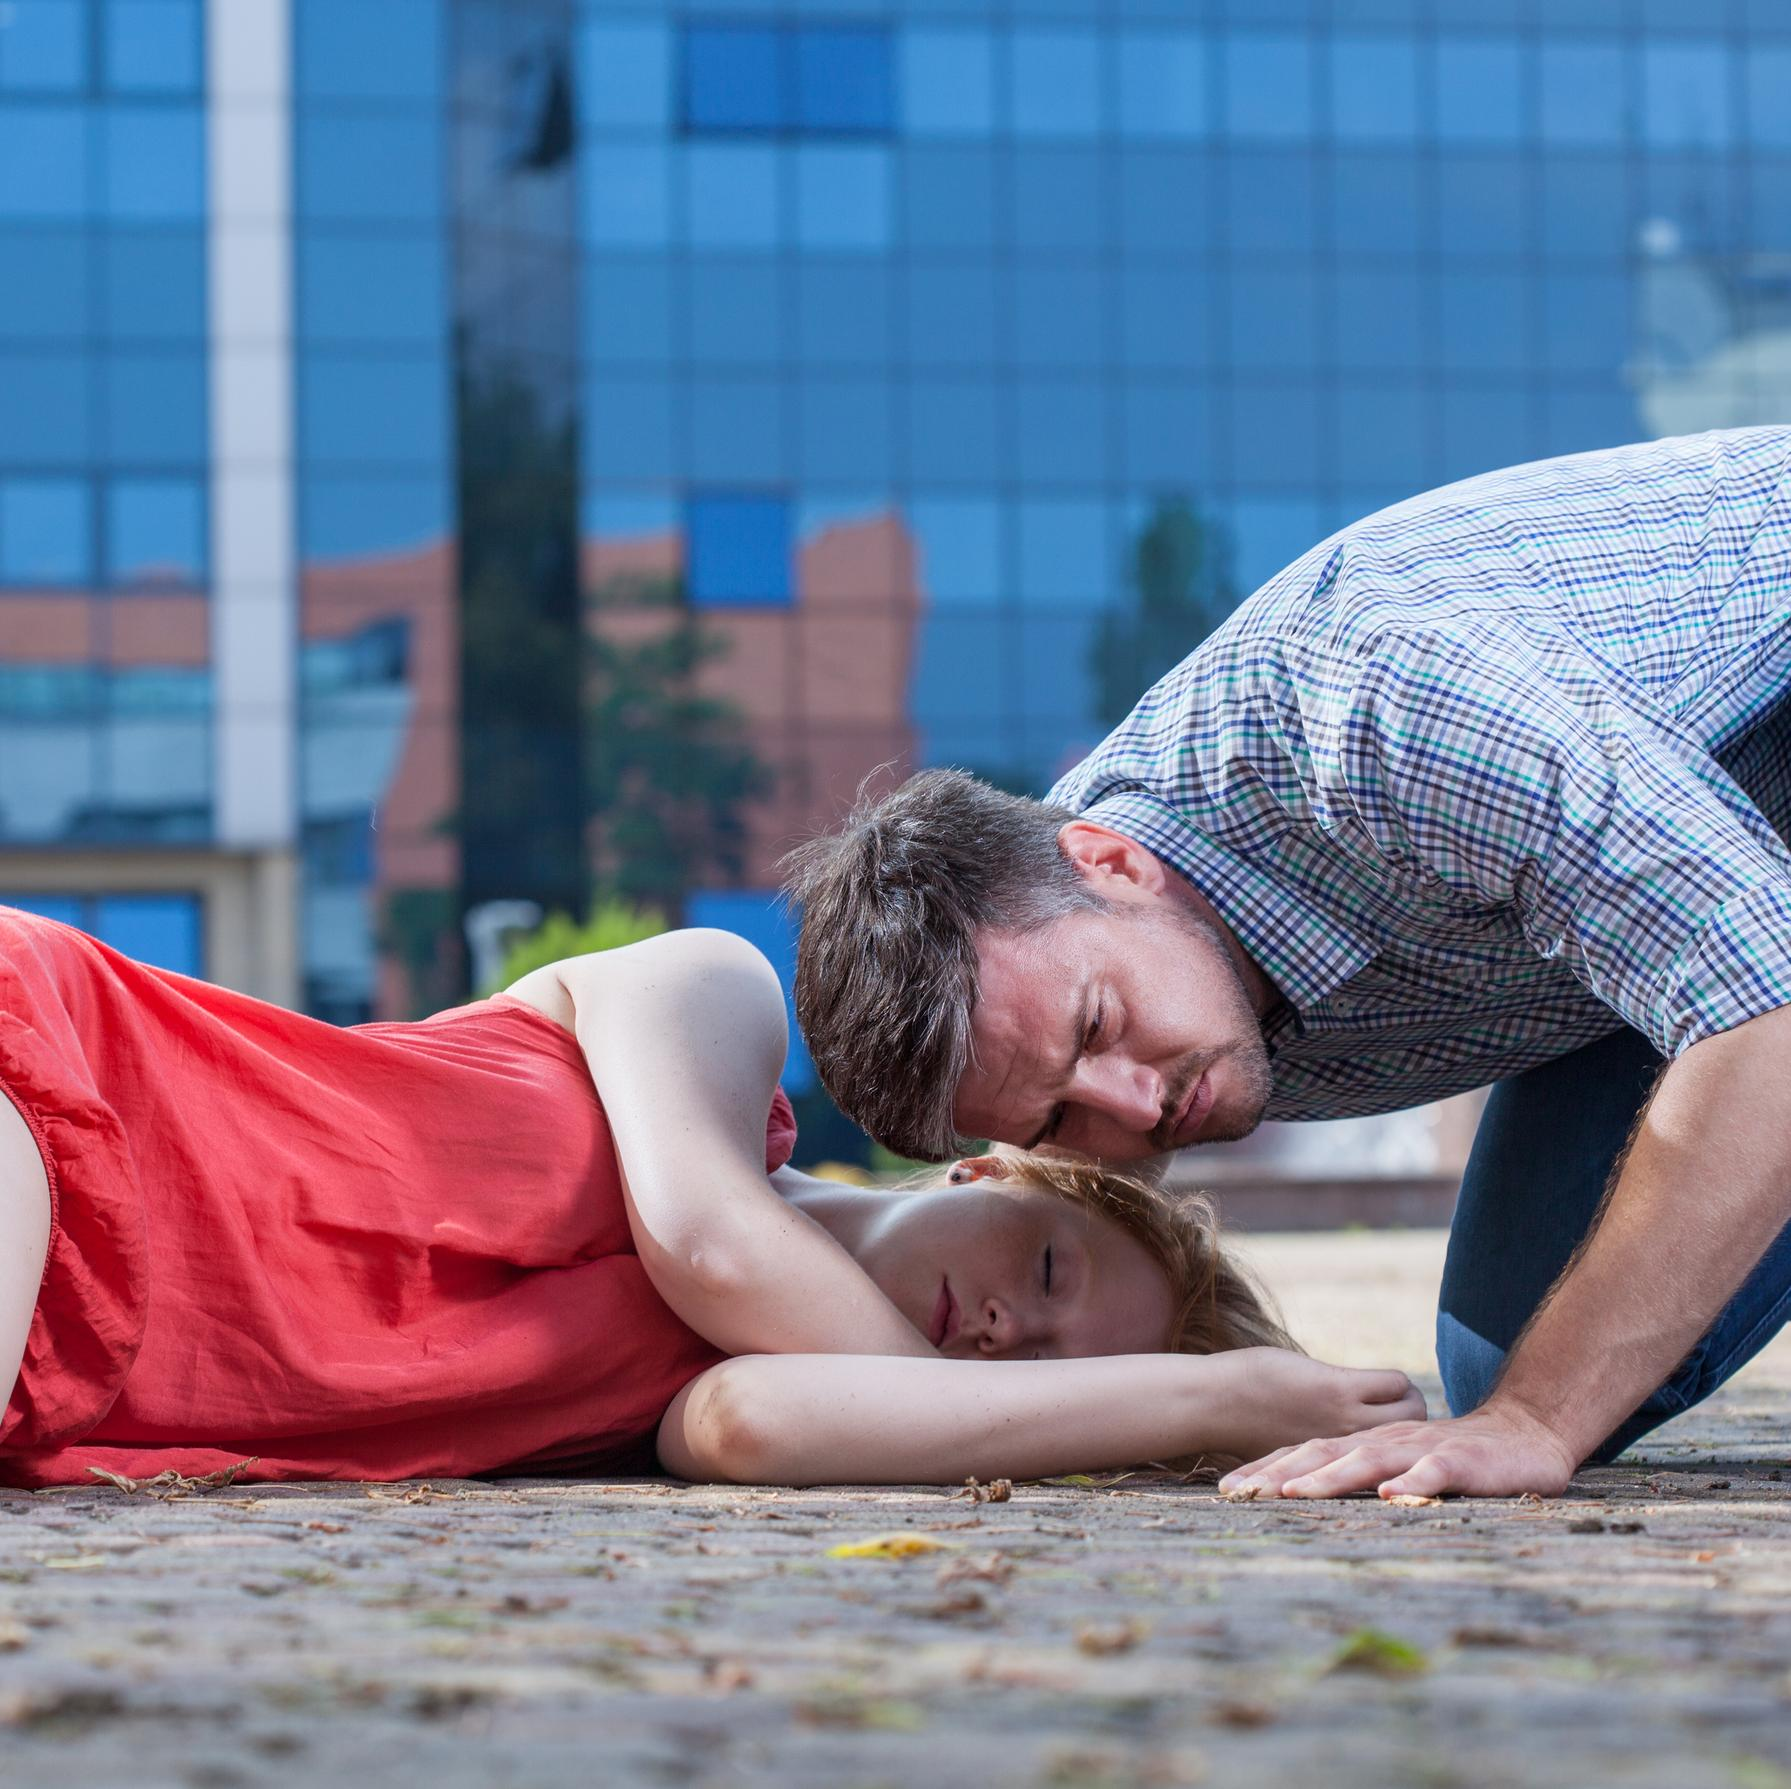 Secourir une victime de convulsions : les gestes d'urgence !